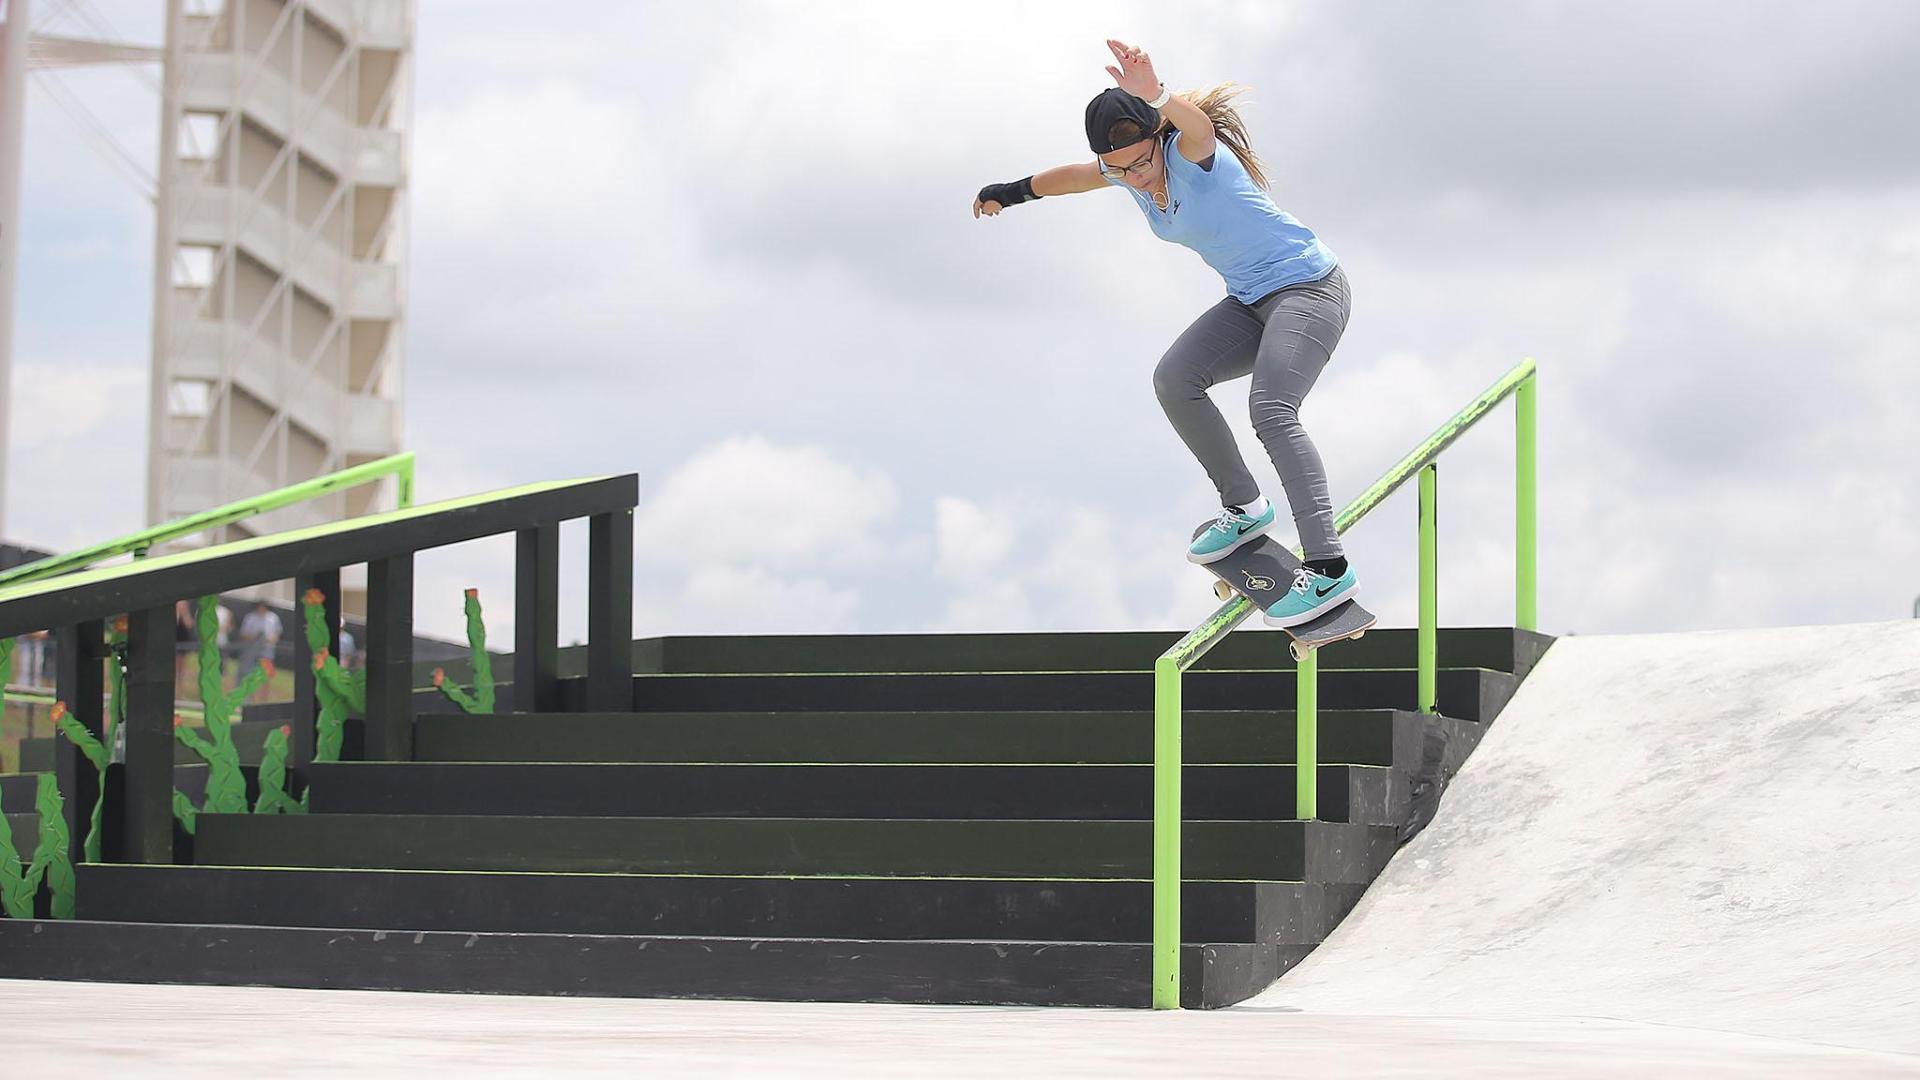 X Games Austin Skateboard